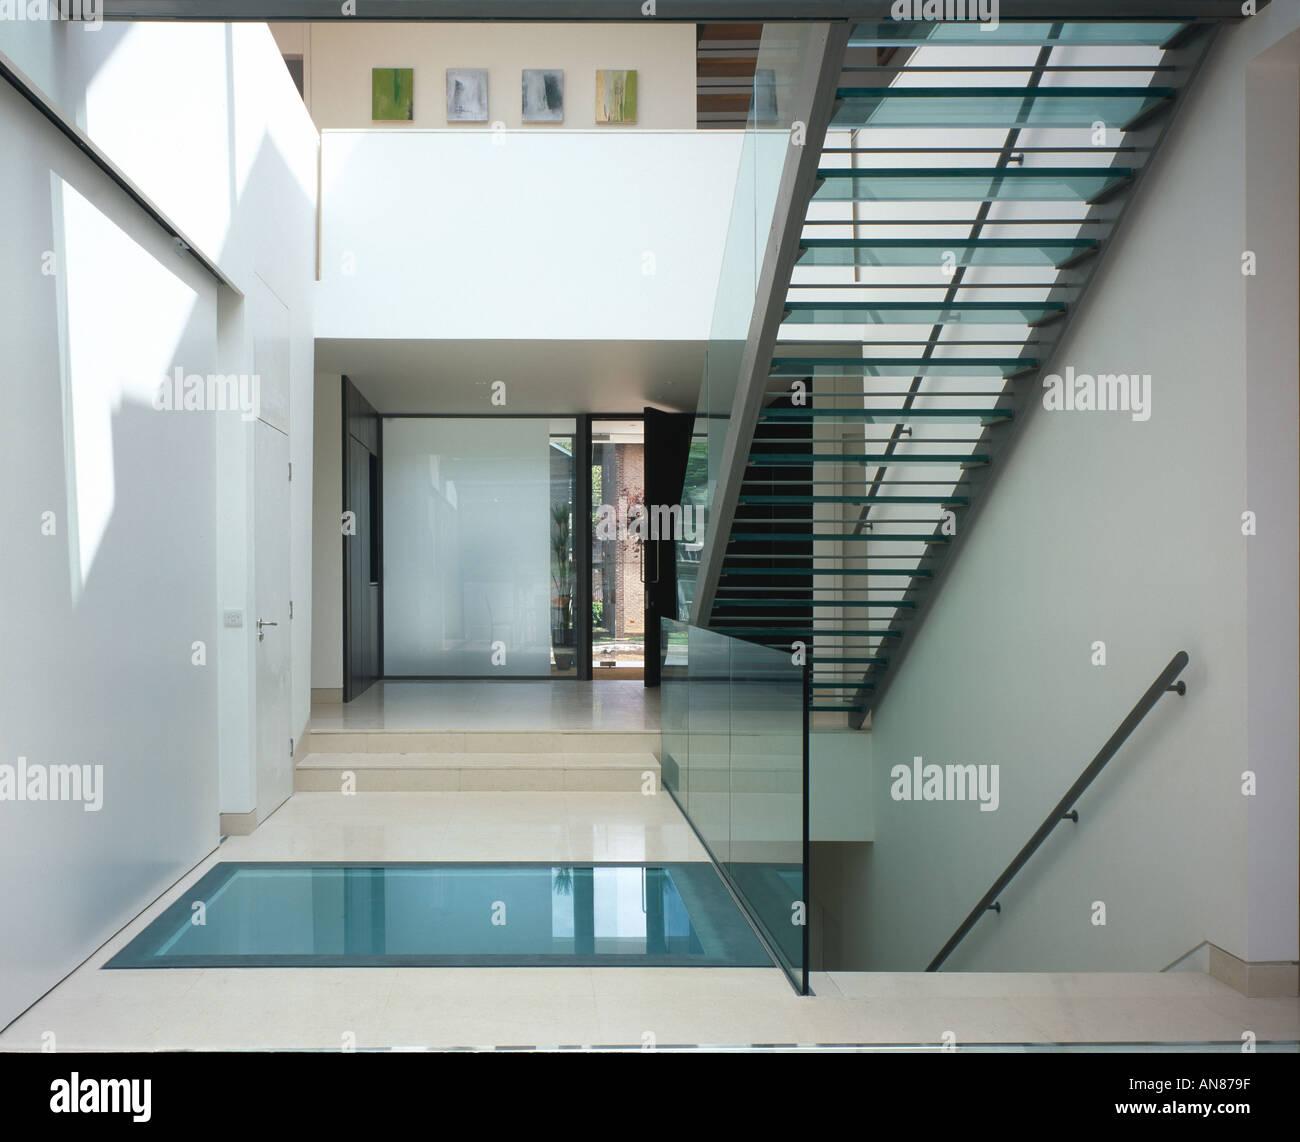 Modernes Haus mit Keller Pool, Hampstead - Innenraum - Eingangshalle ...